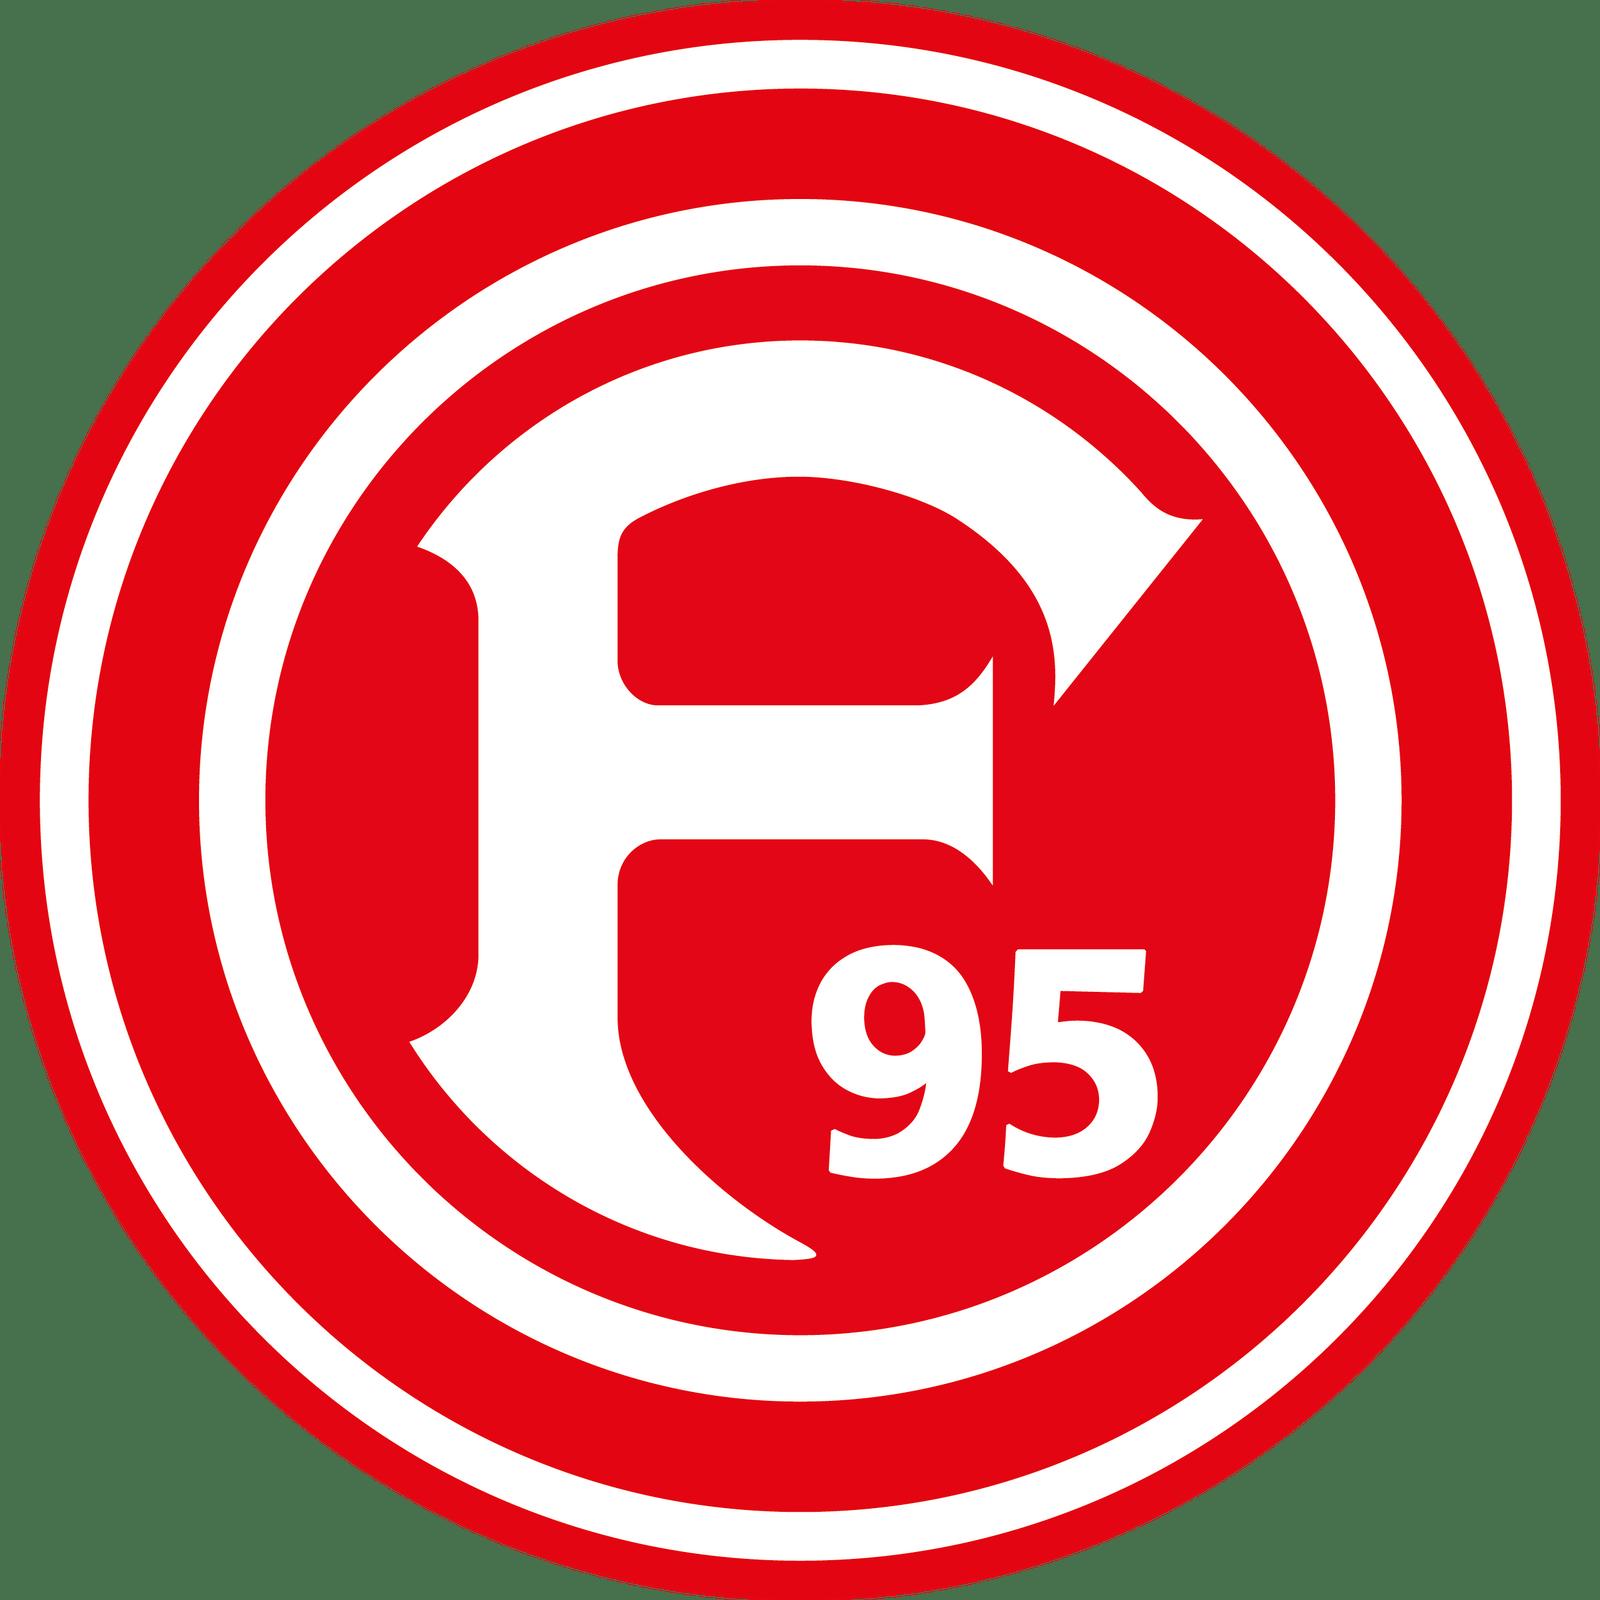 Rhein Live Tv